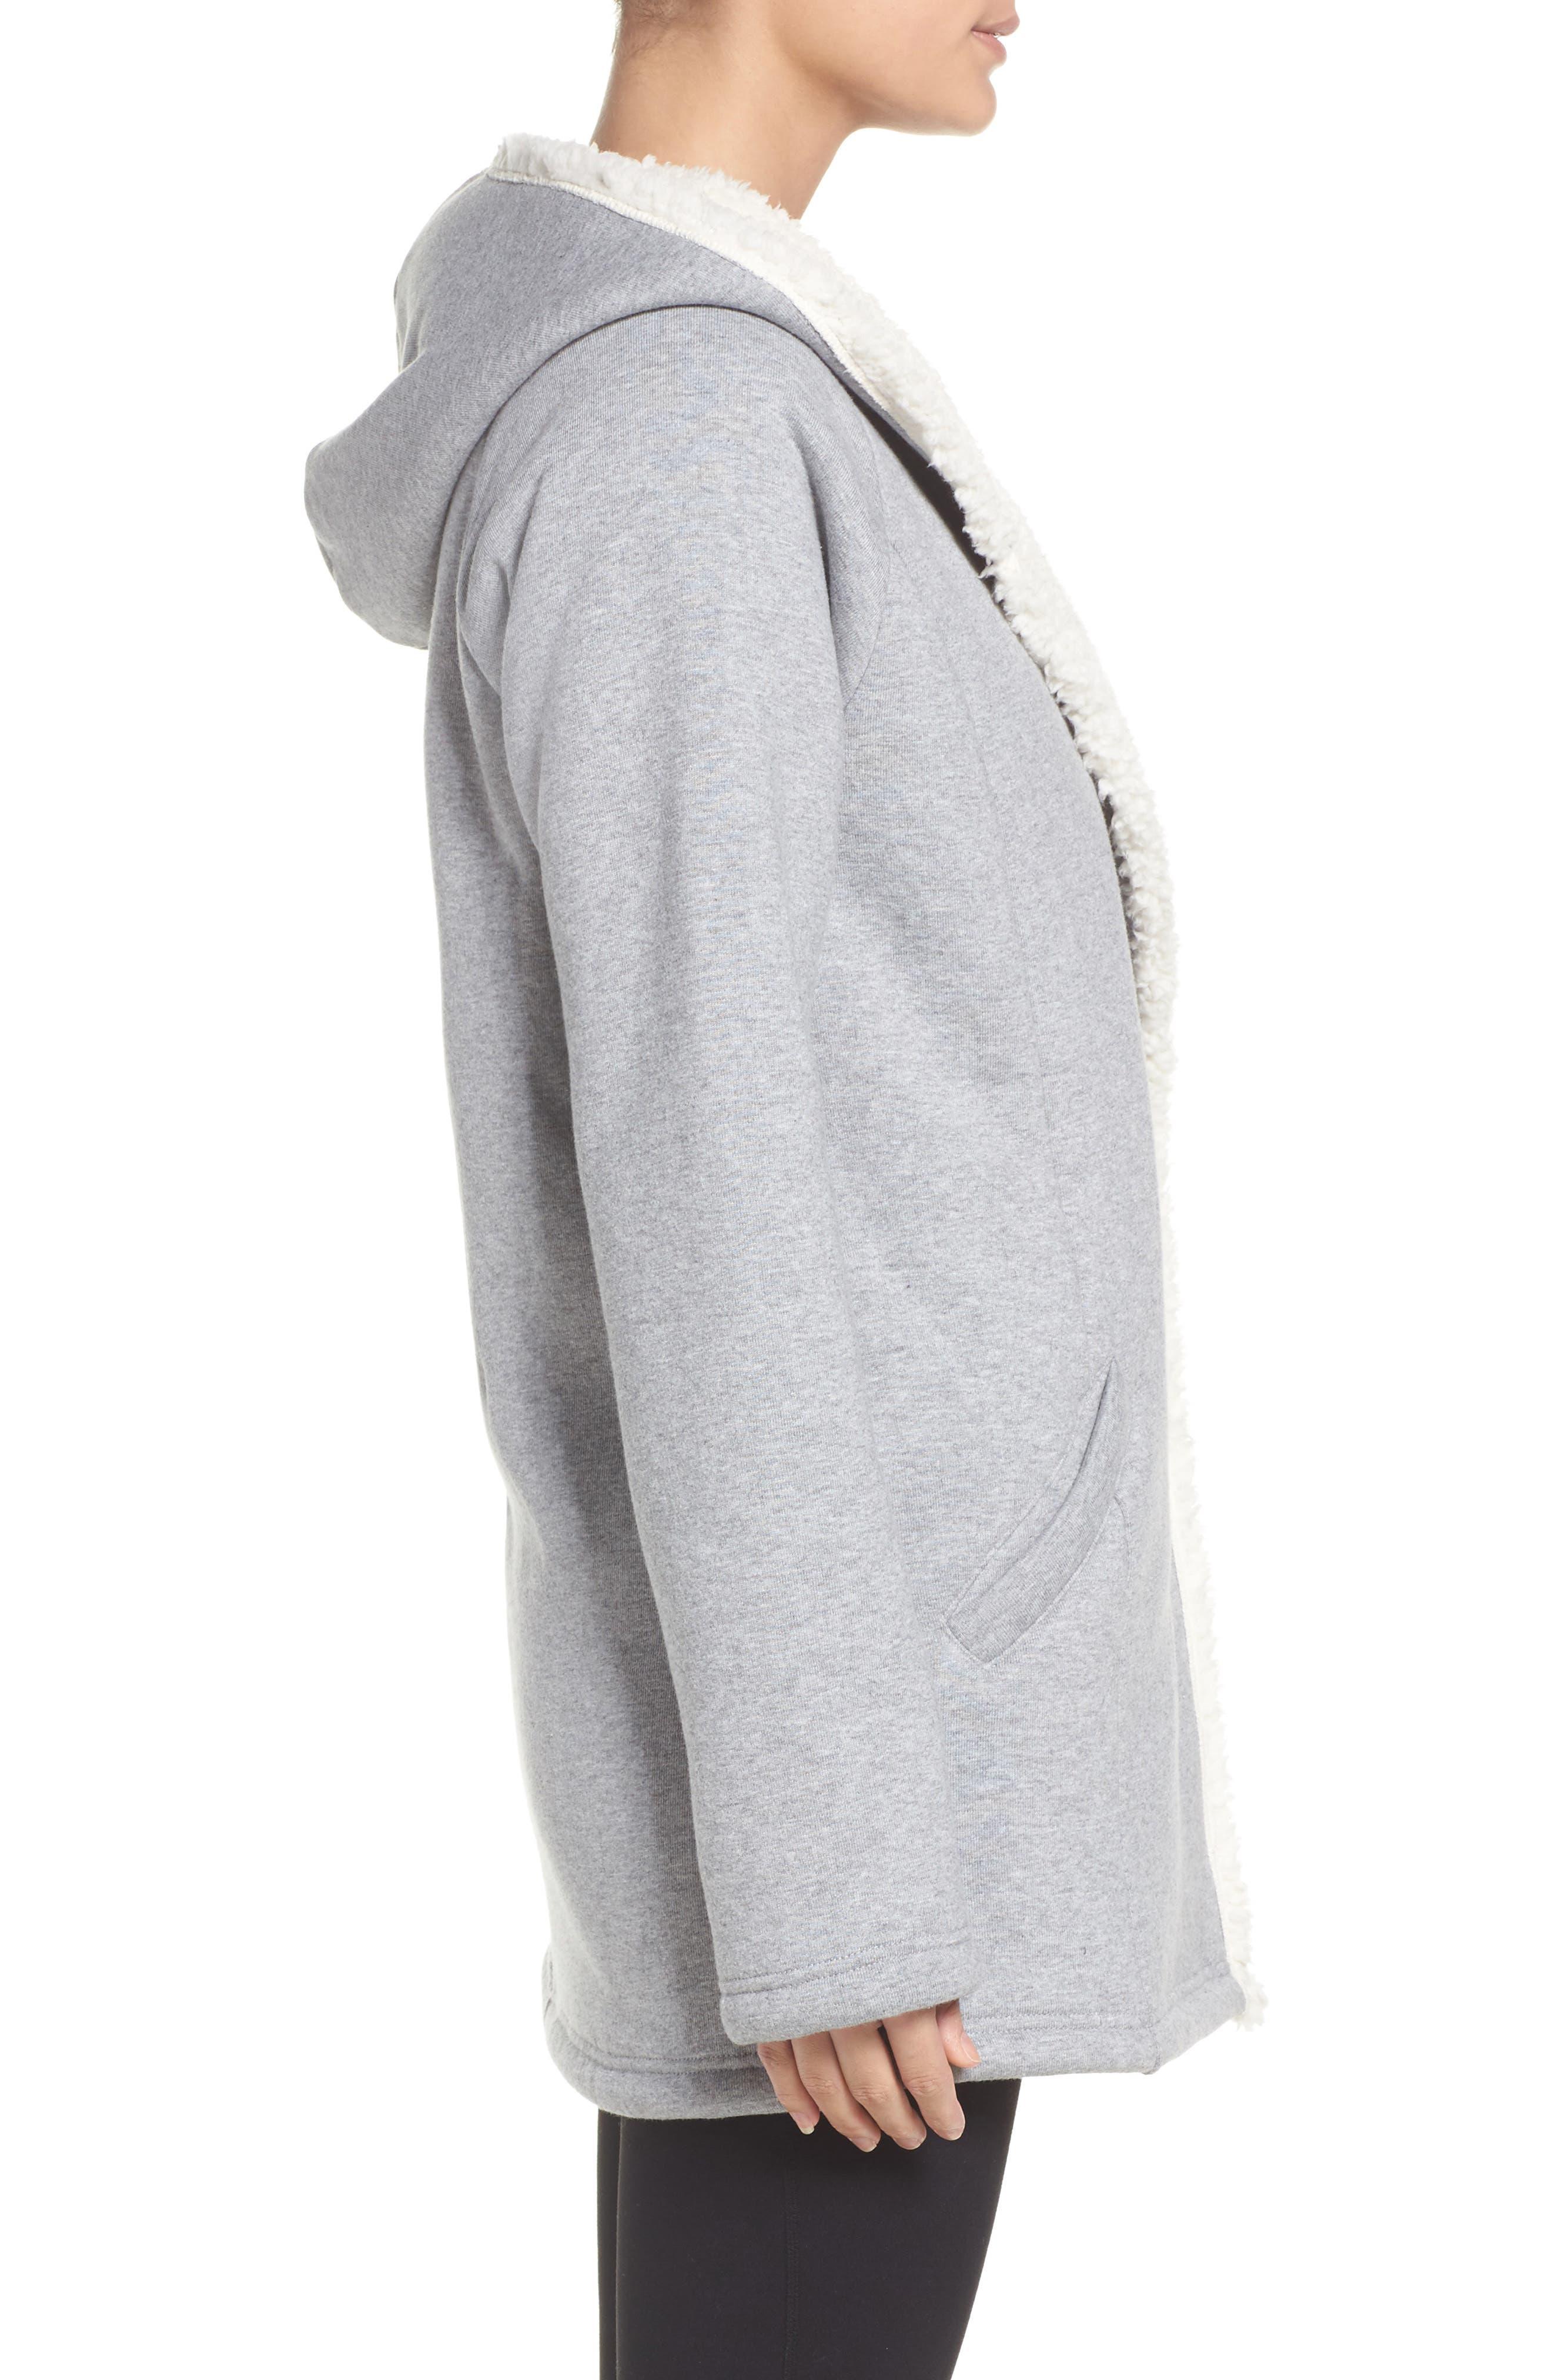 Chalet Fleece Lined Hooded Wrap,                             Alternate thumbnail 3, color,                             030